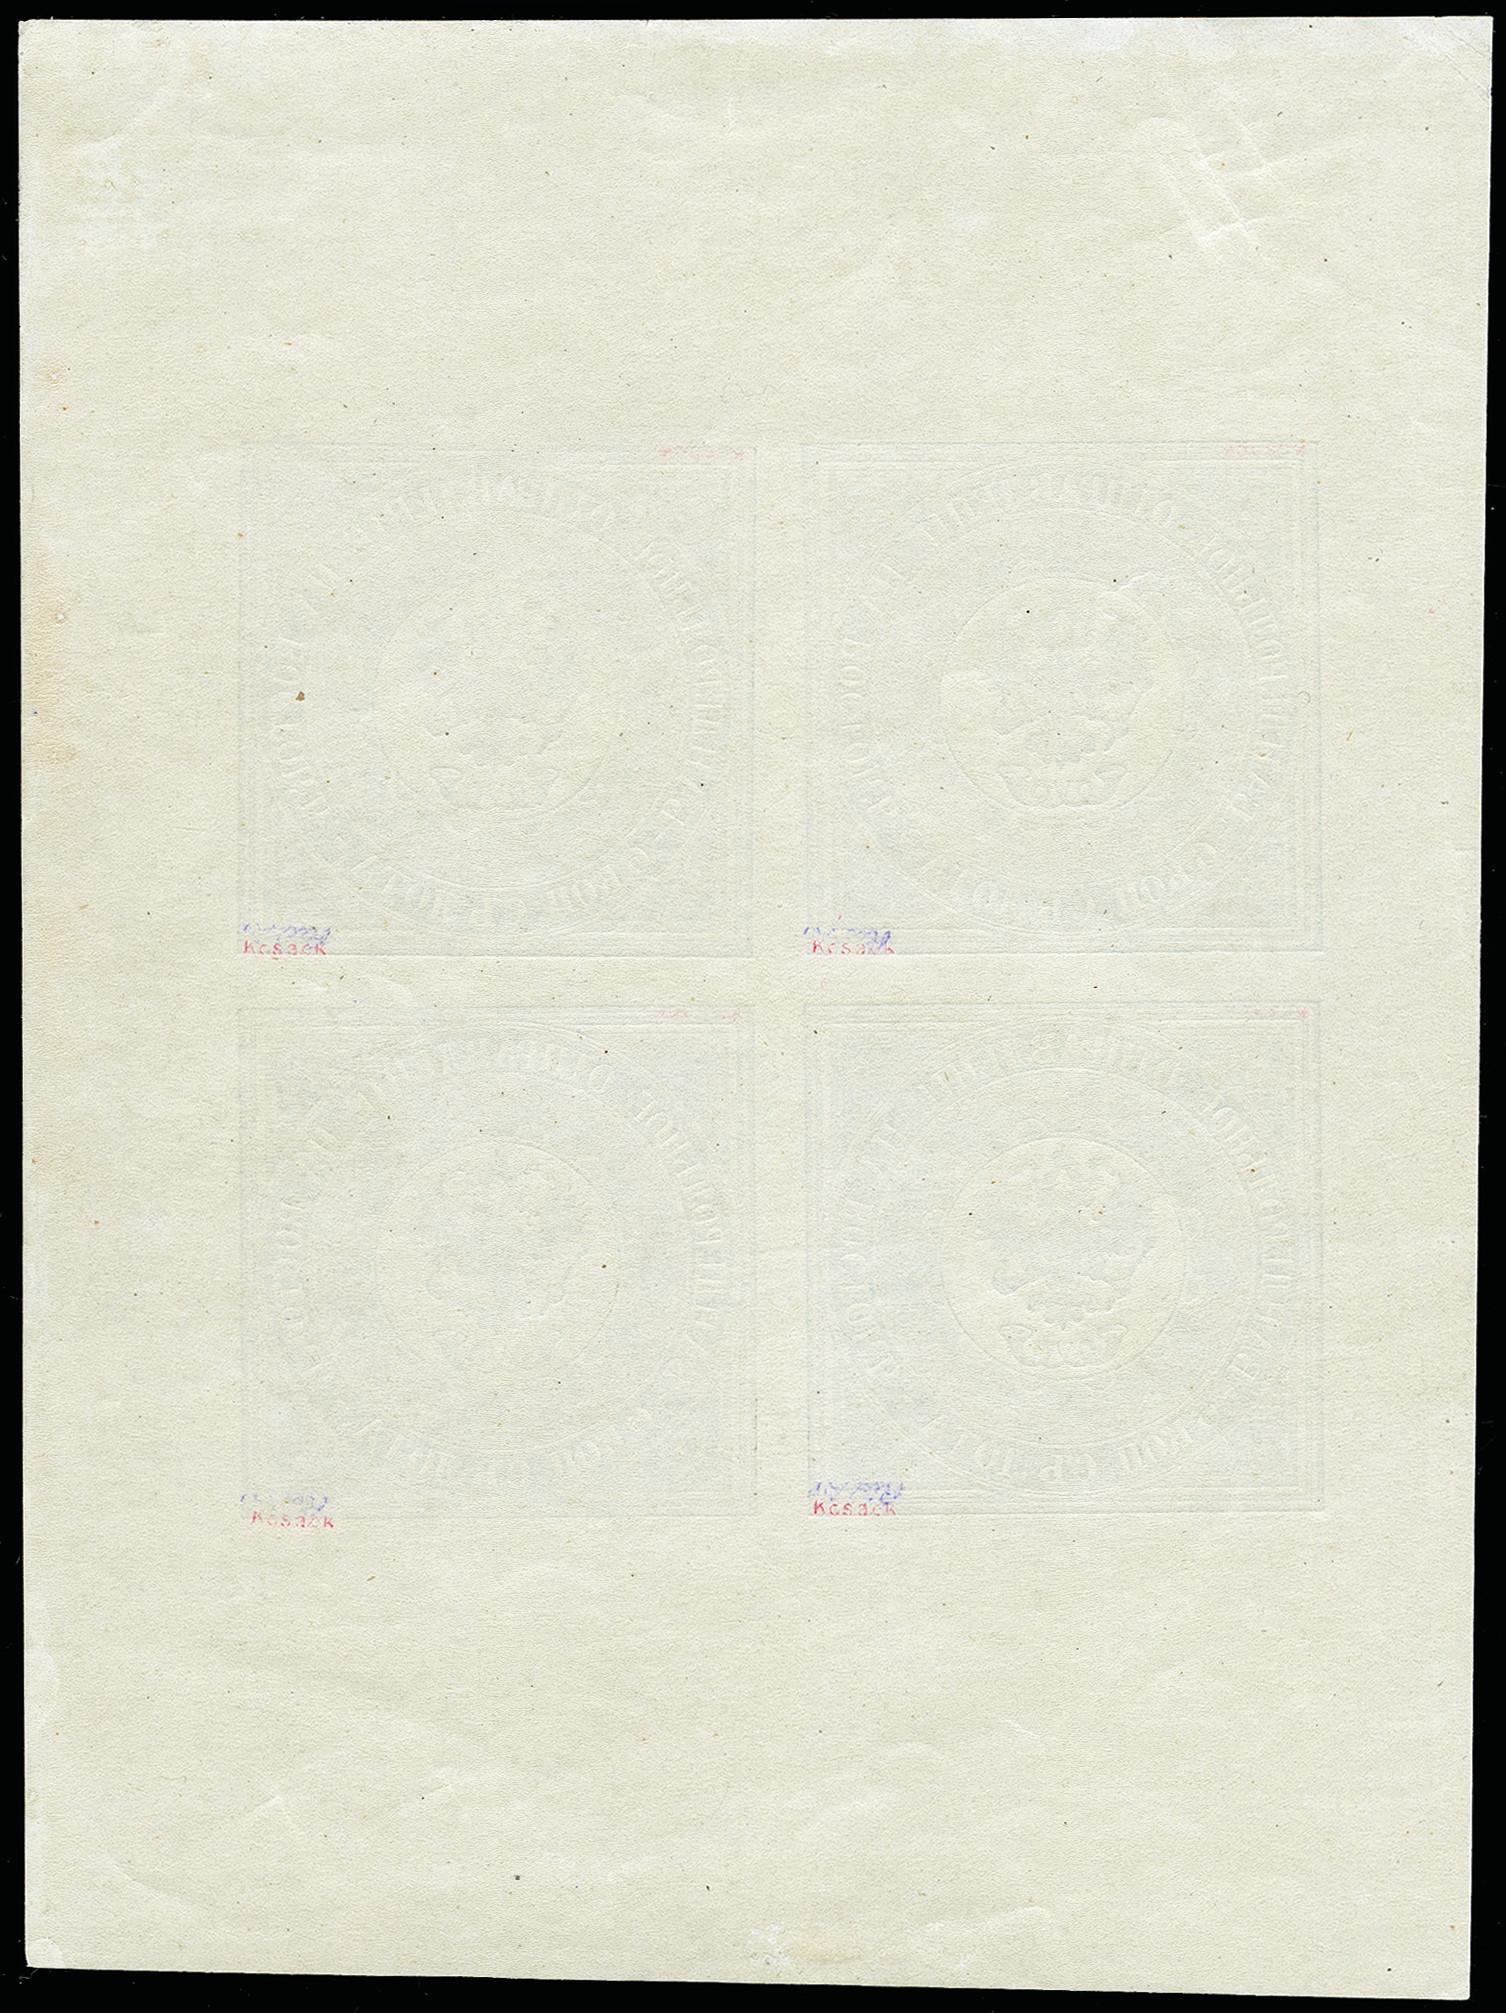 Lot 6031 - levant Issues of the ImperialPost, Ship Mail -  Heinrich Koehler Auktionen 373rd Heinrich Köhler auction - Day 1